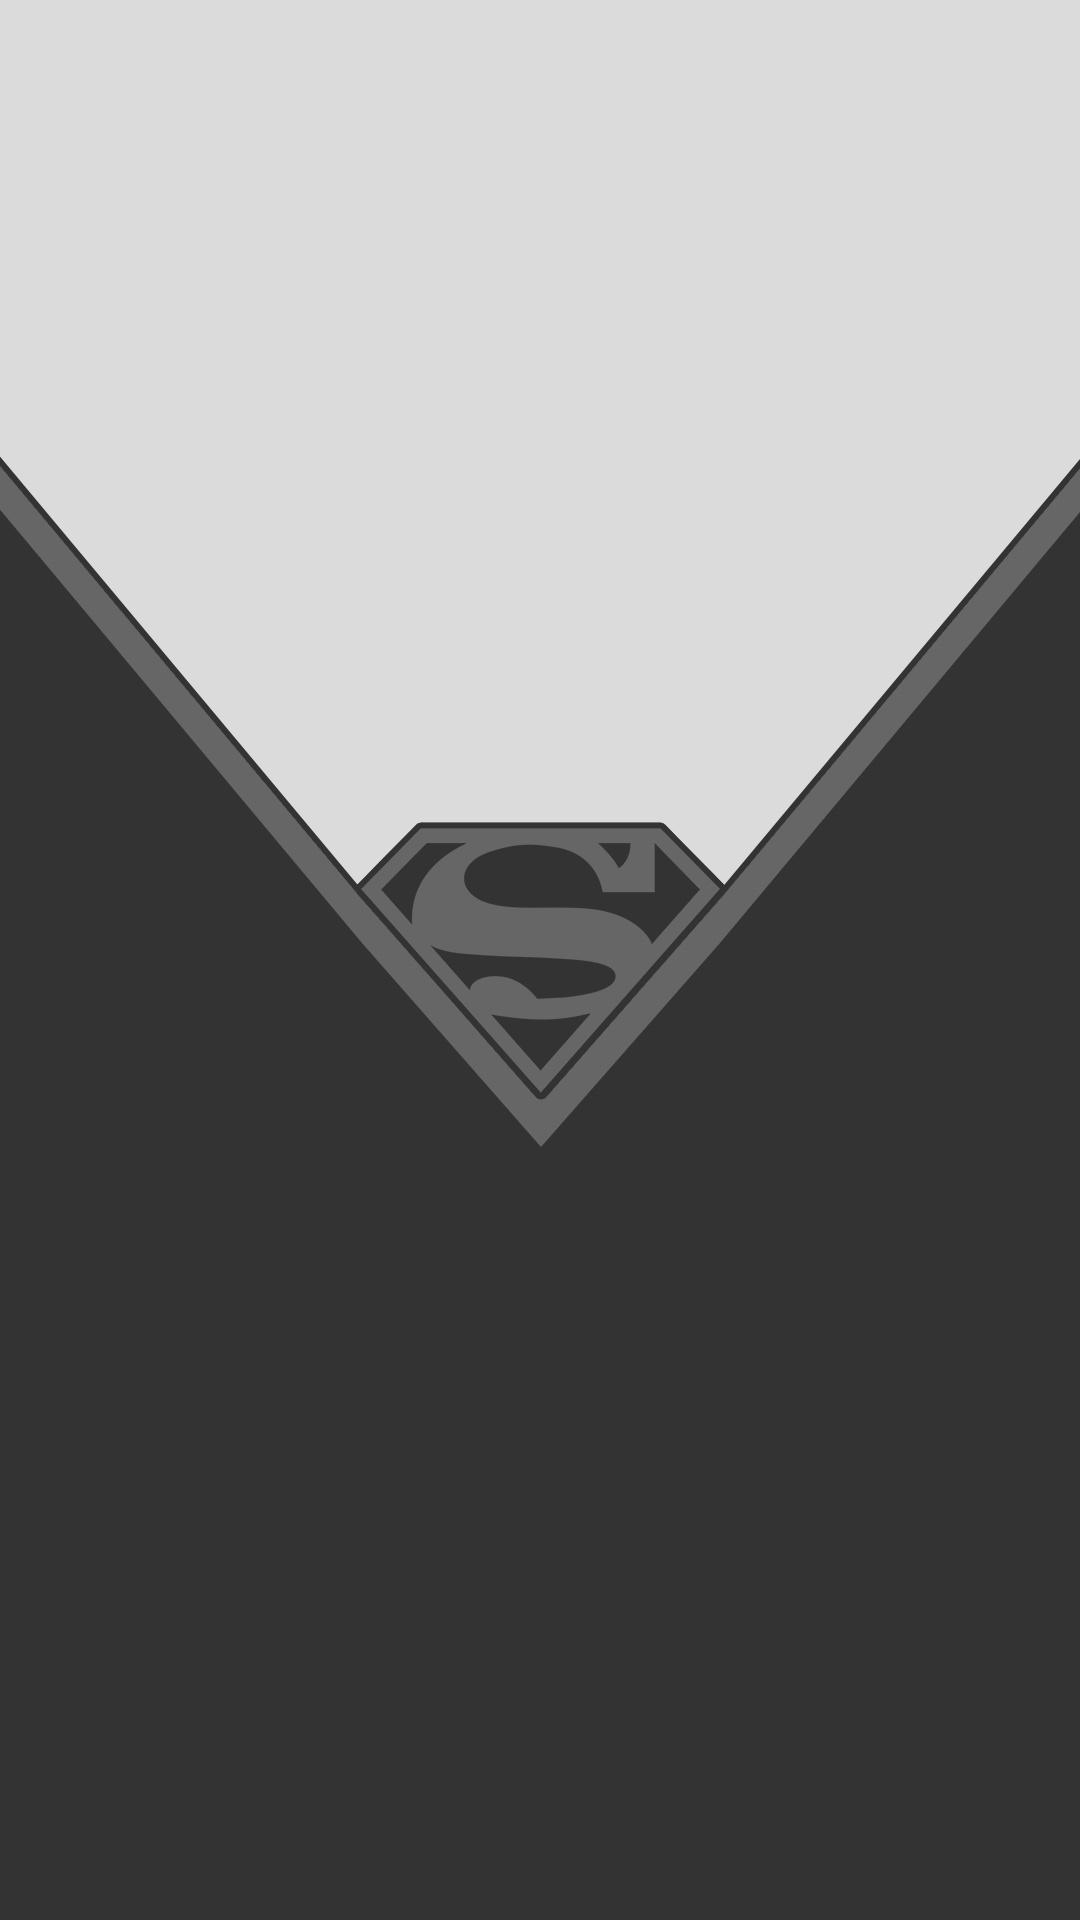 Black White Superman Minimal Wallpaper